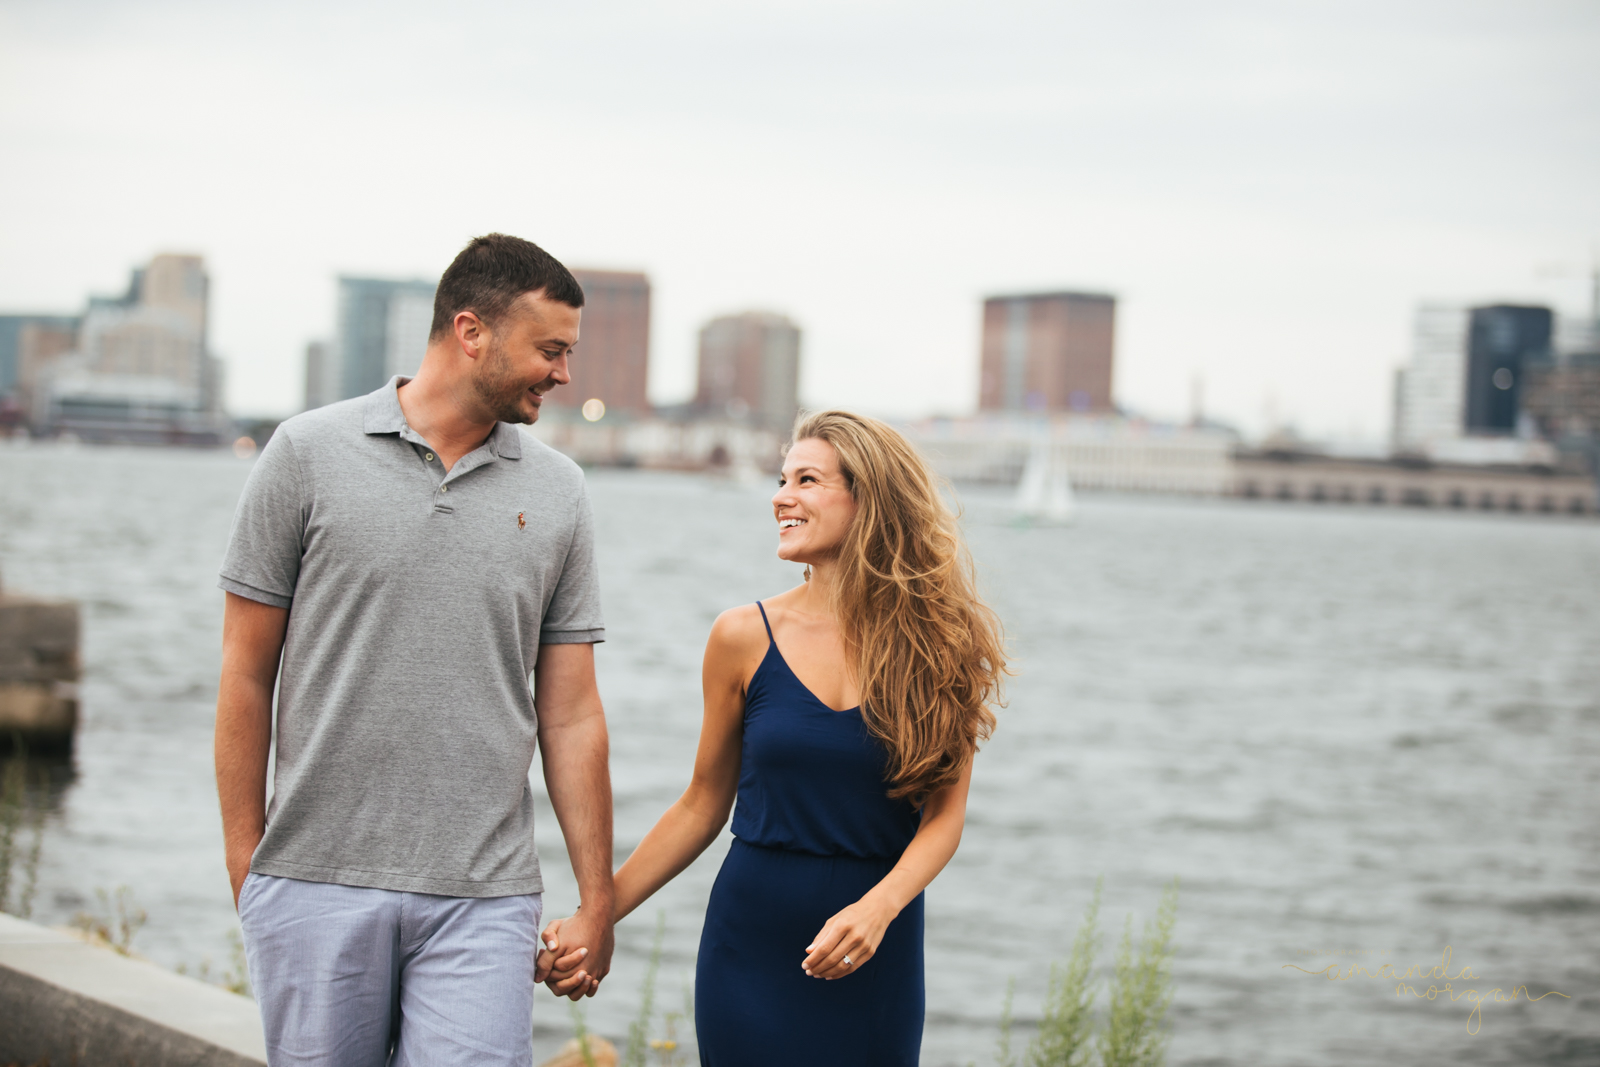 Hyatt-Regency-Boston-Harbor-Wedding-Amanda-Morgan-3.jpg